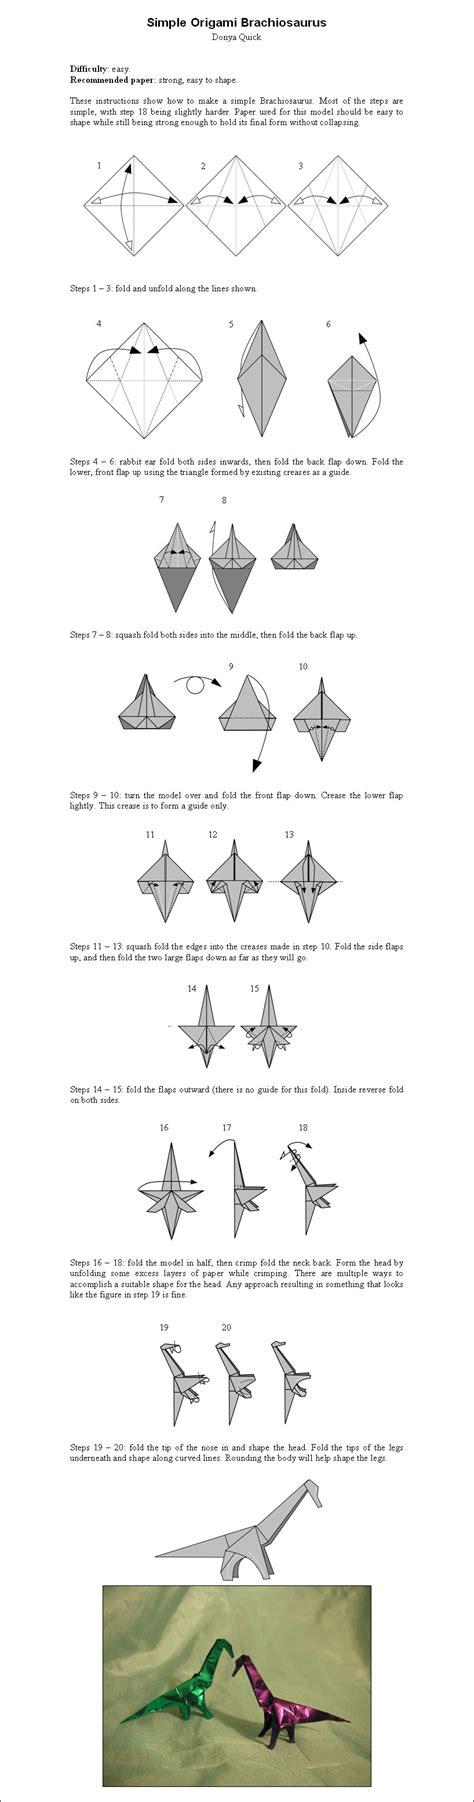 Origami Dinosaur Diagram - origami dinosaurs a list of origami dinosaur